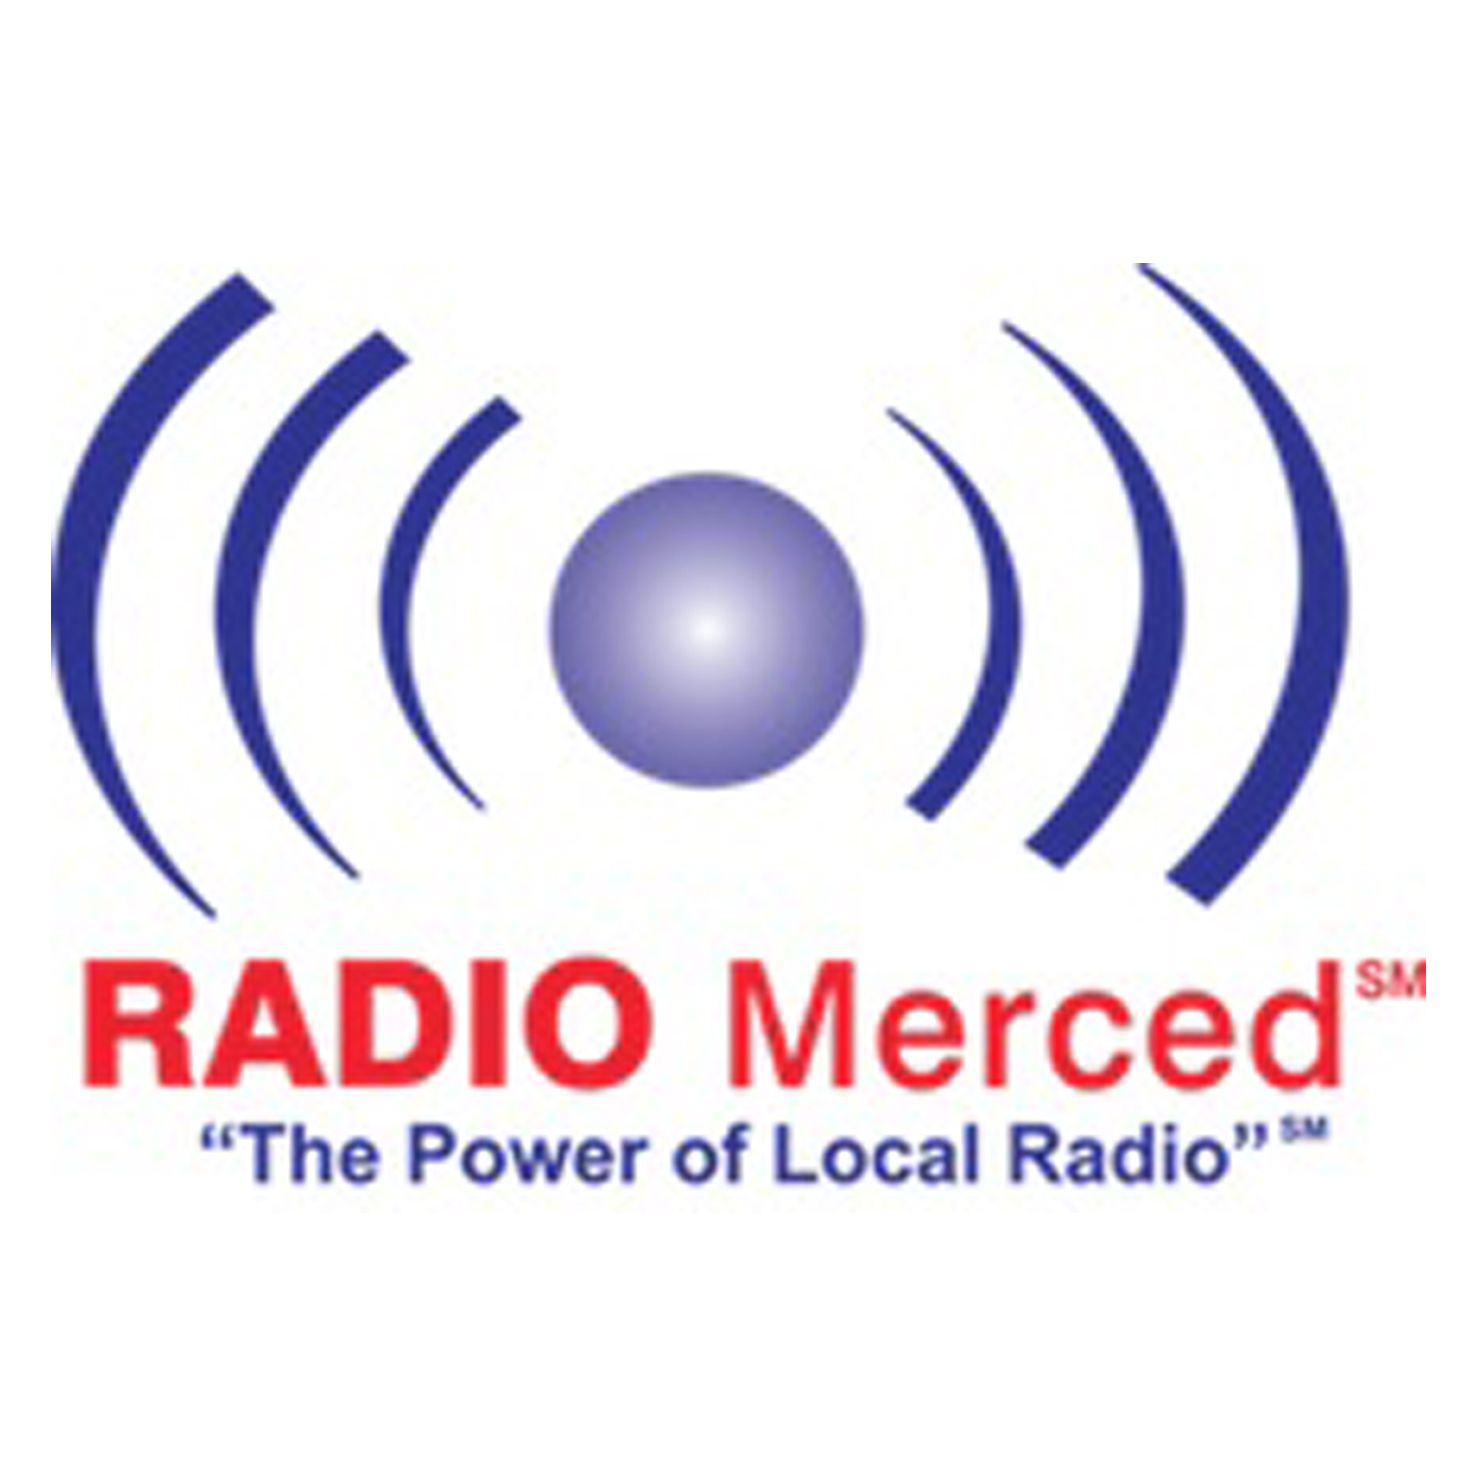 RADIO MERCED